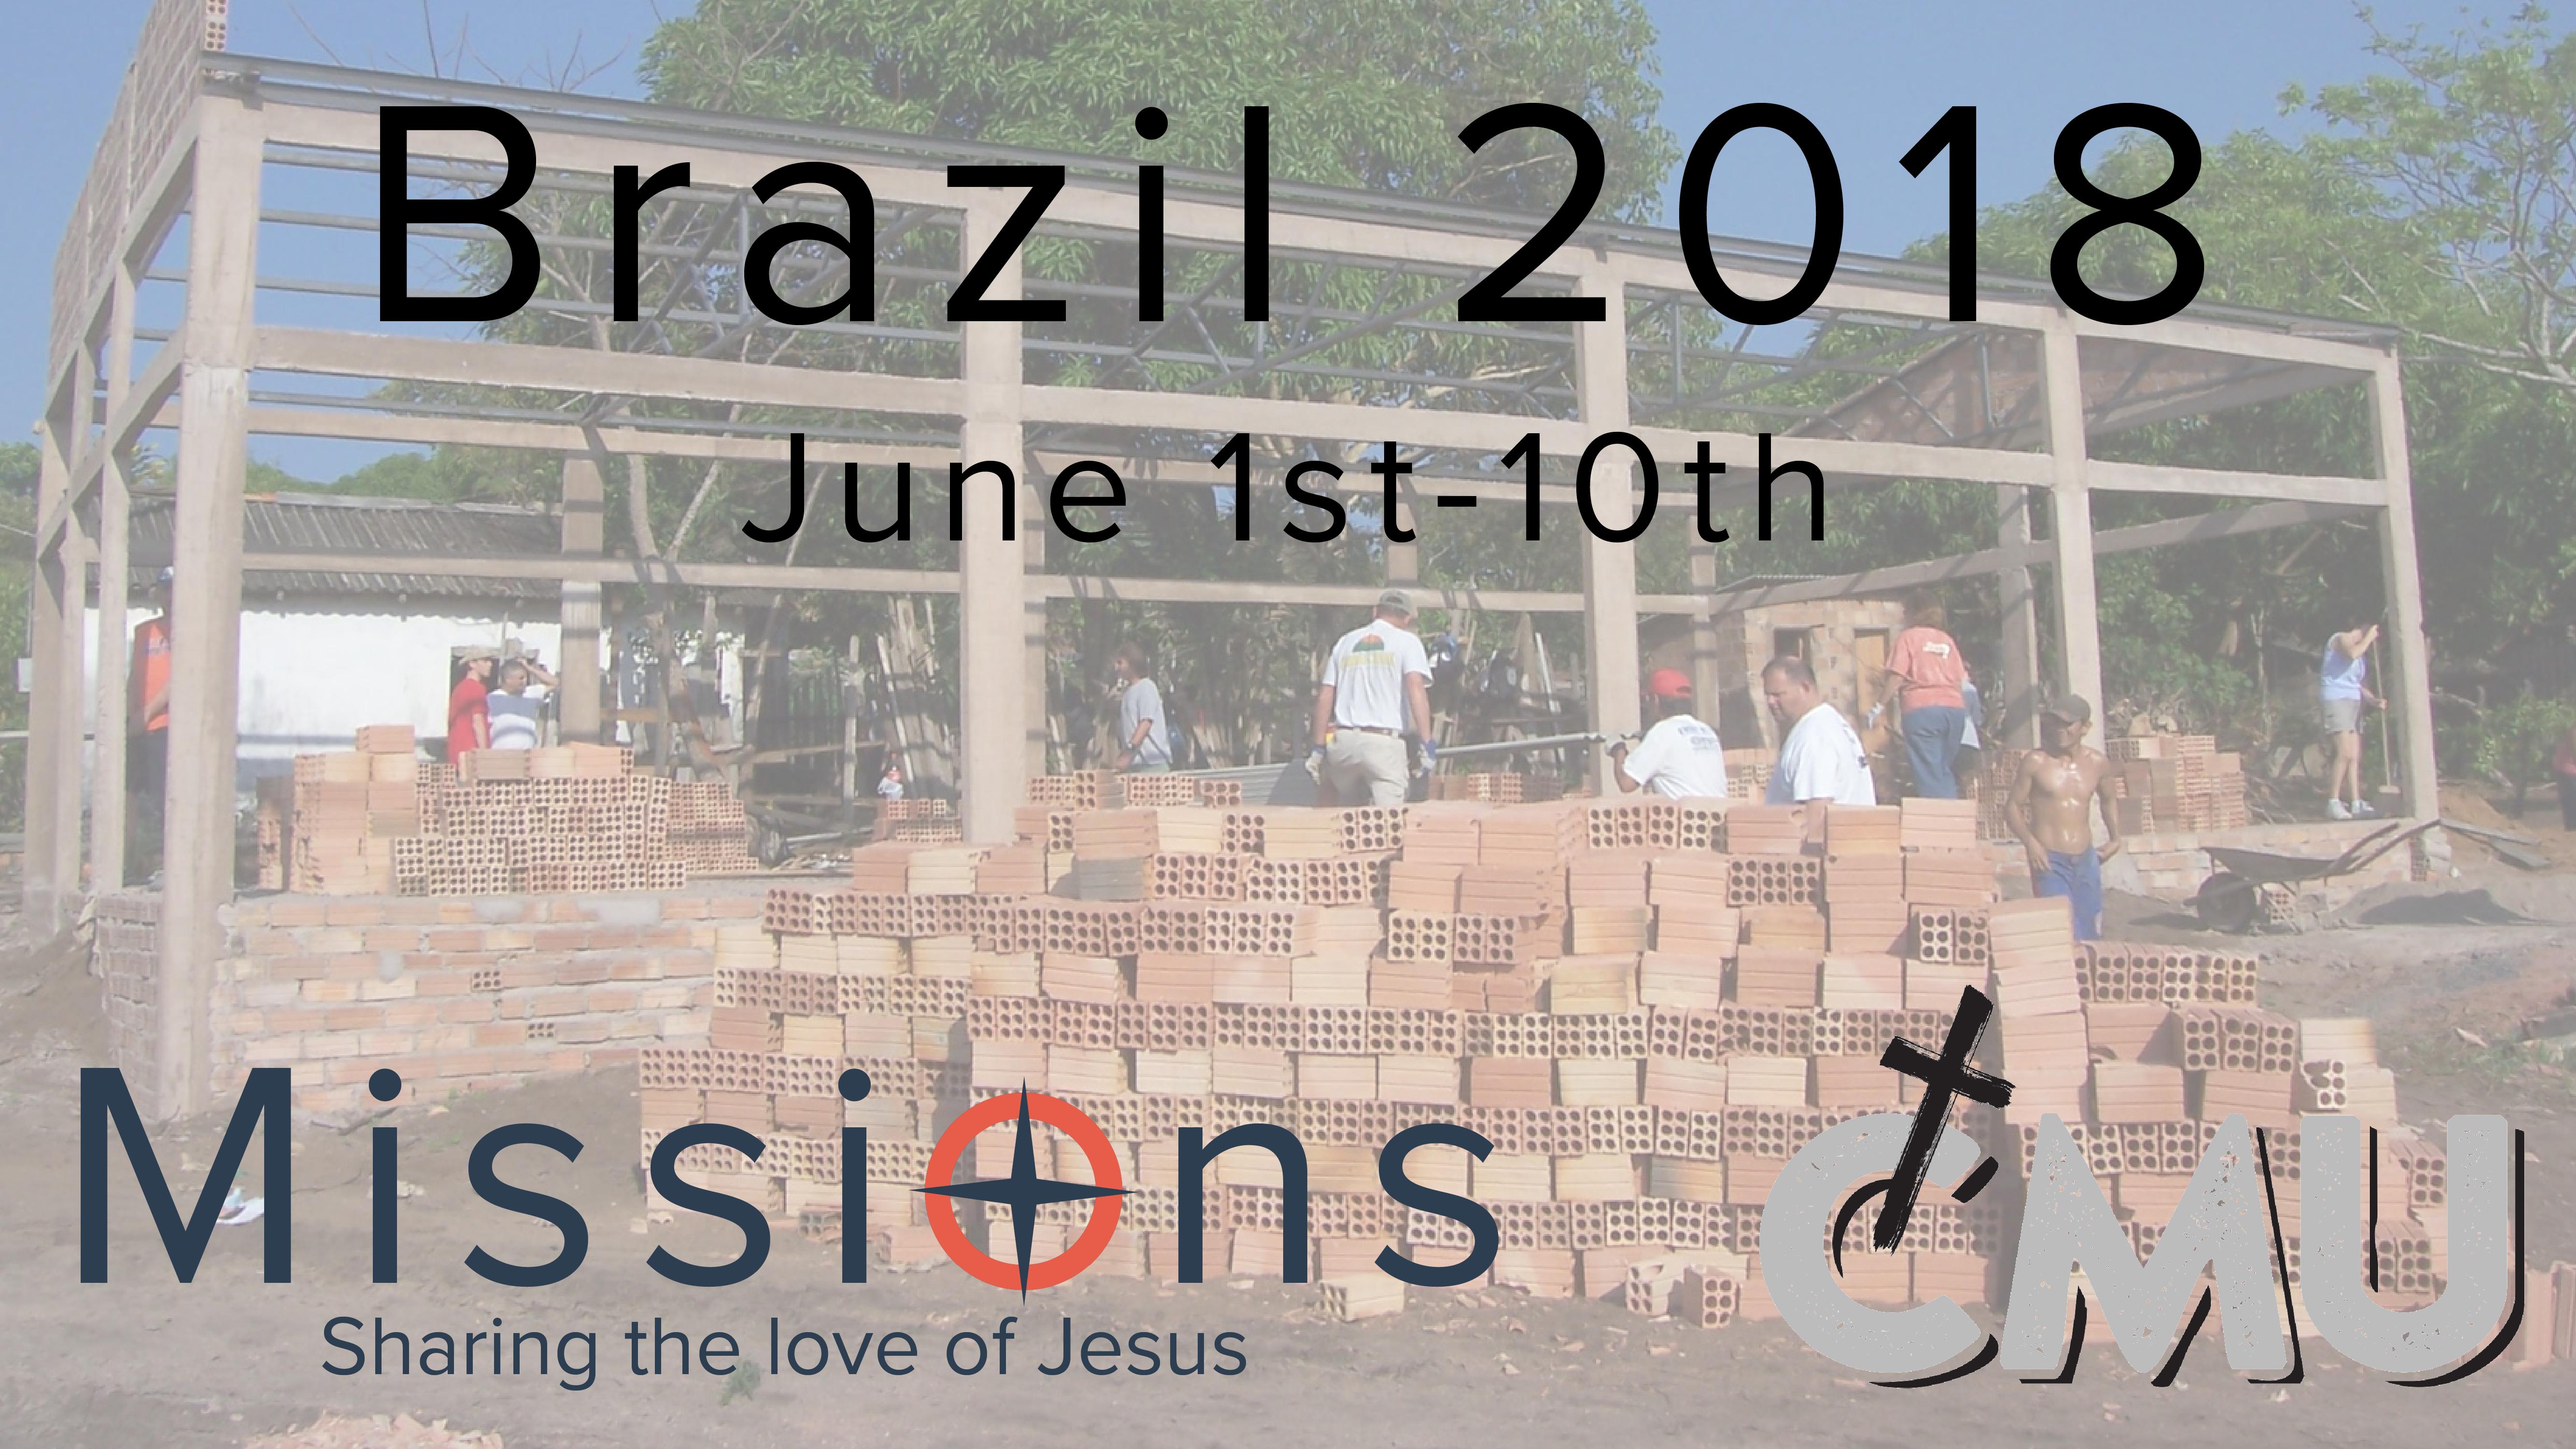 Mission brazil 2018 01